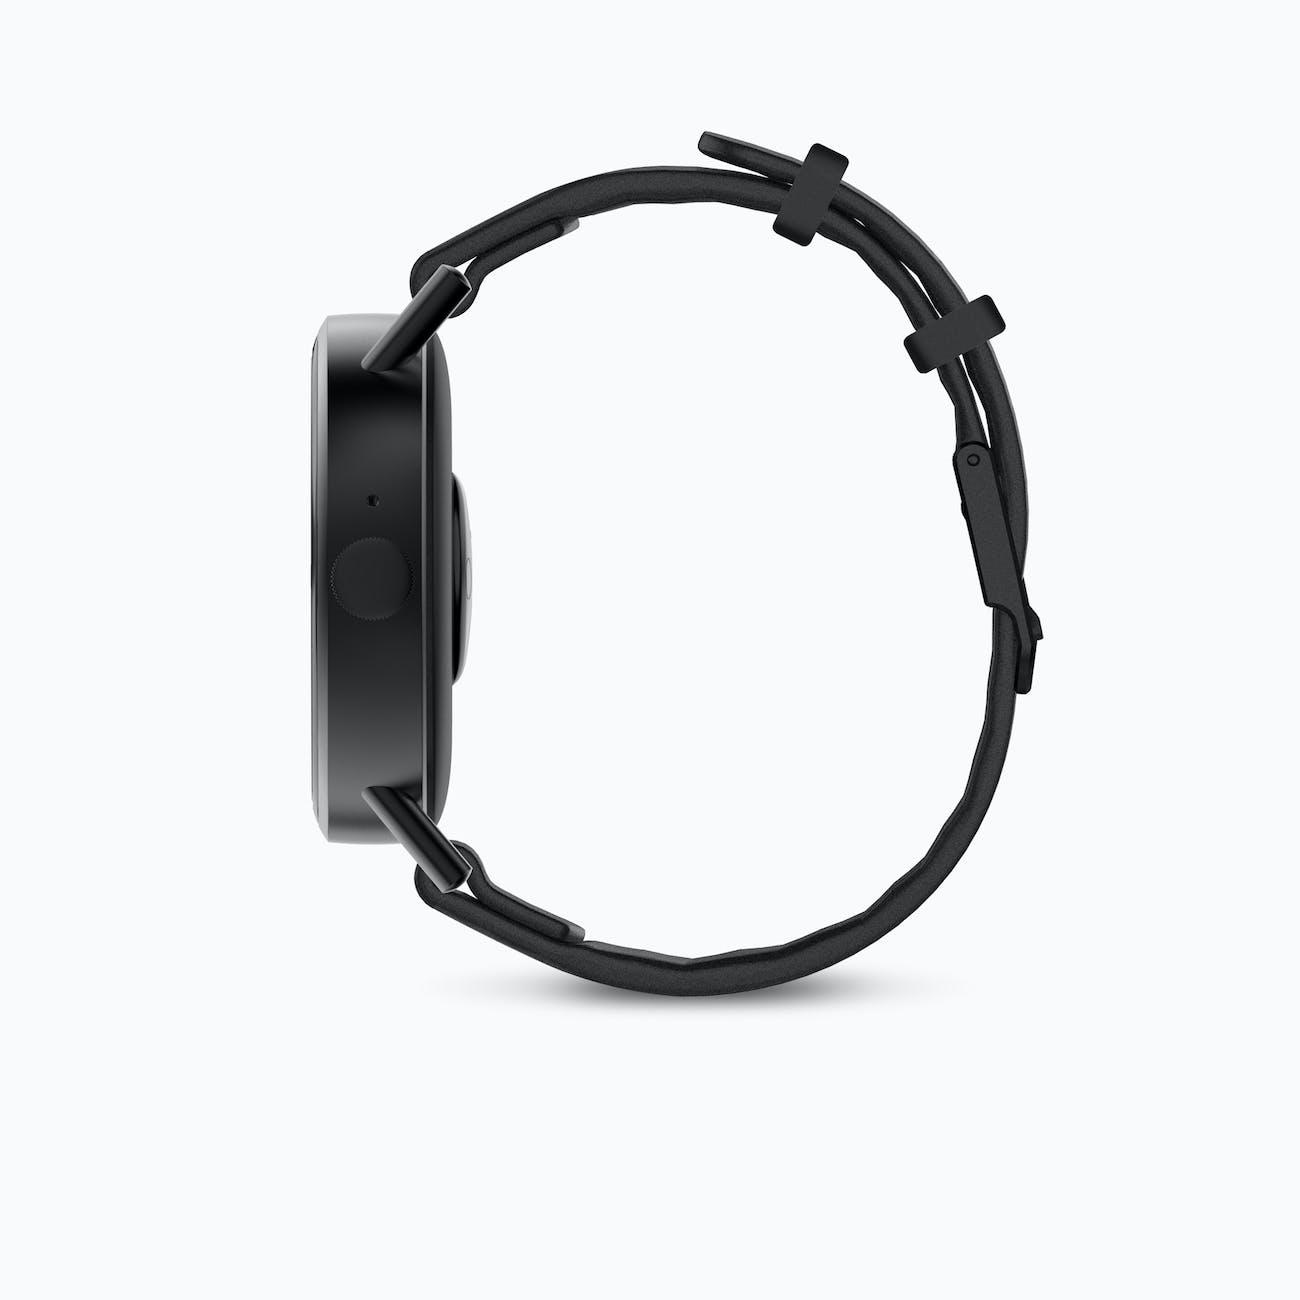 Misfit Vapor 2 Smartwatch: Ten Things You Don't Realize